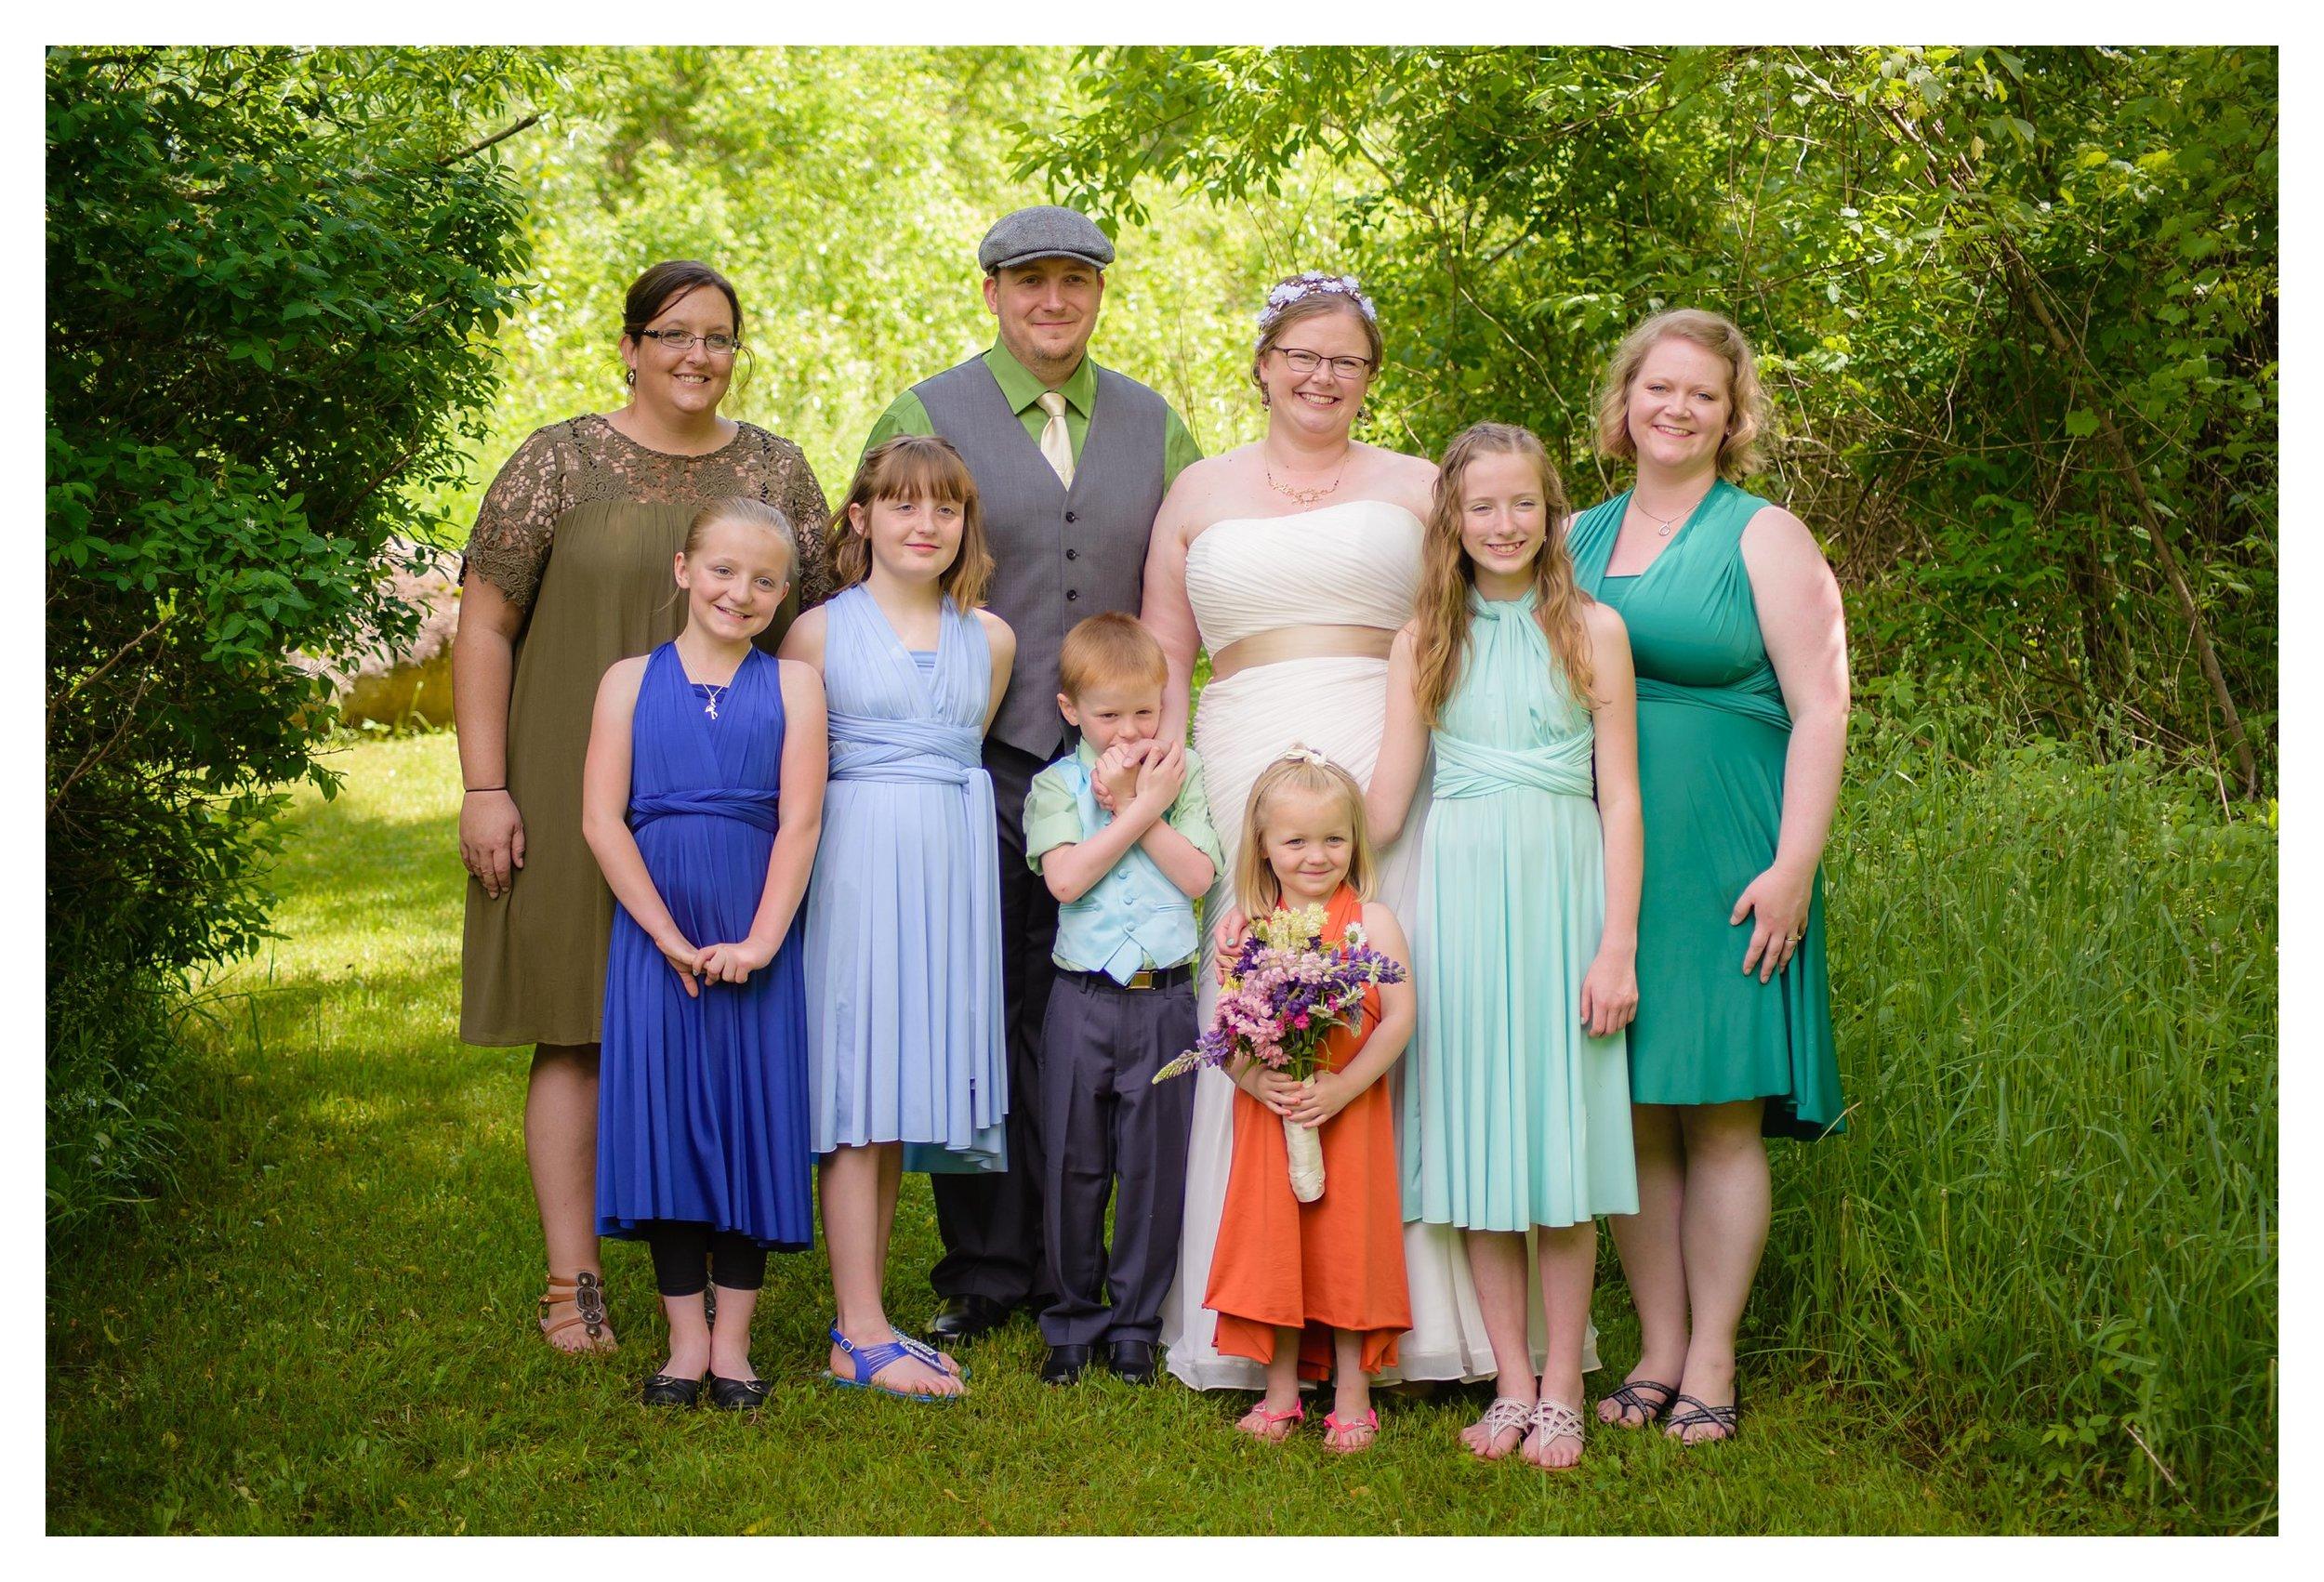 ashland oredock northwoods wisconsin wedding ps 139 photography_0282.jpg